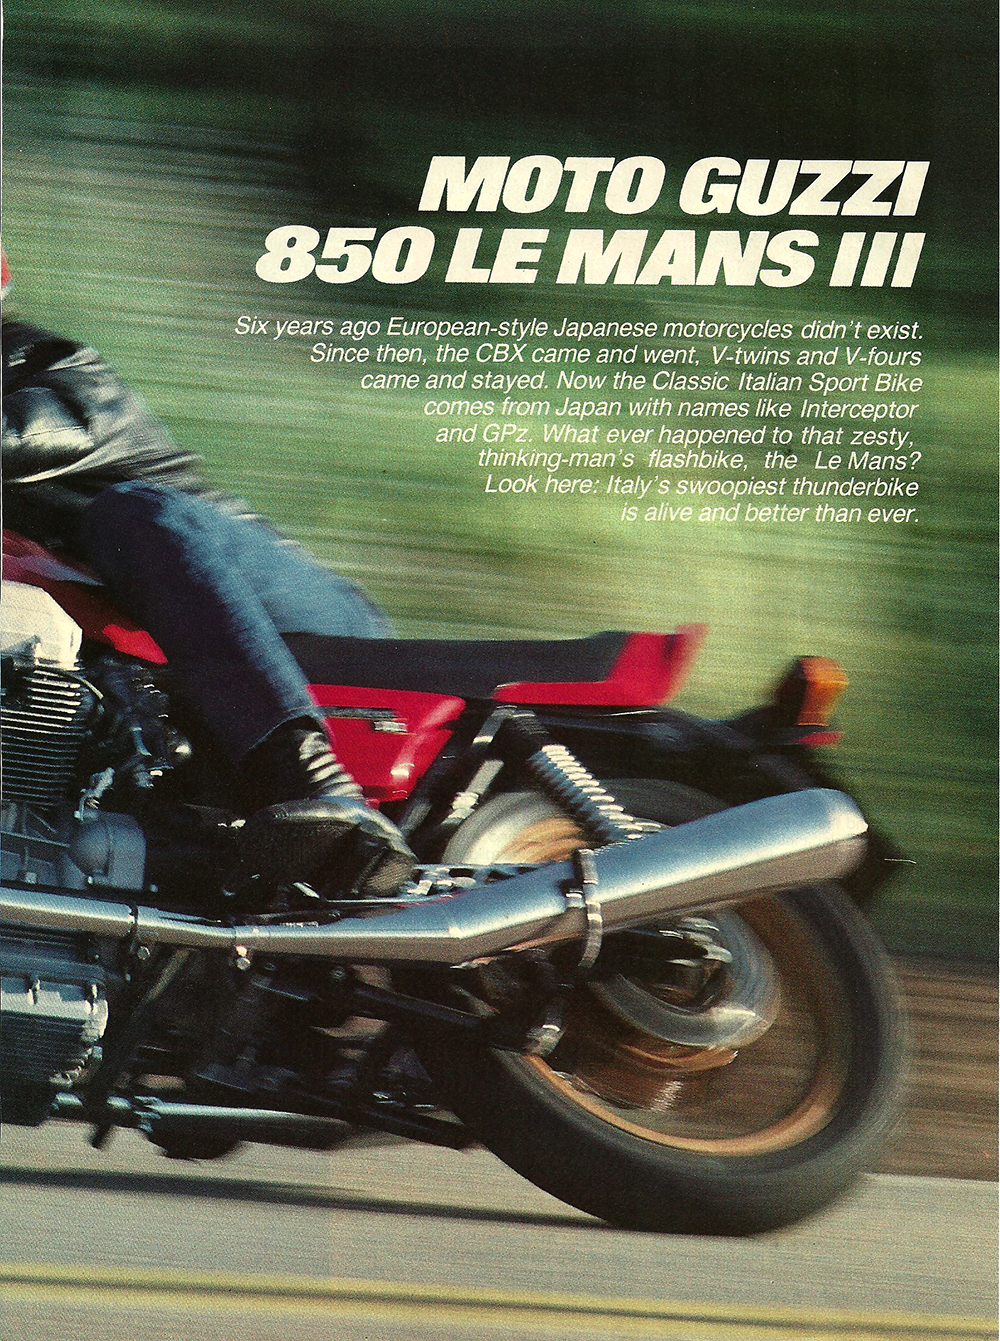 1983 Moto Guzzi 850 Lemans 3 road test 2.jpg